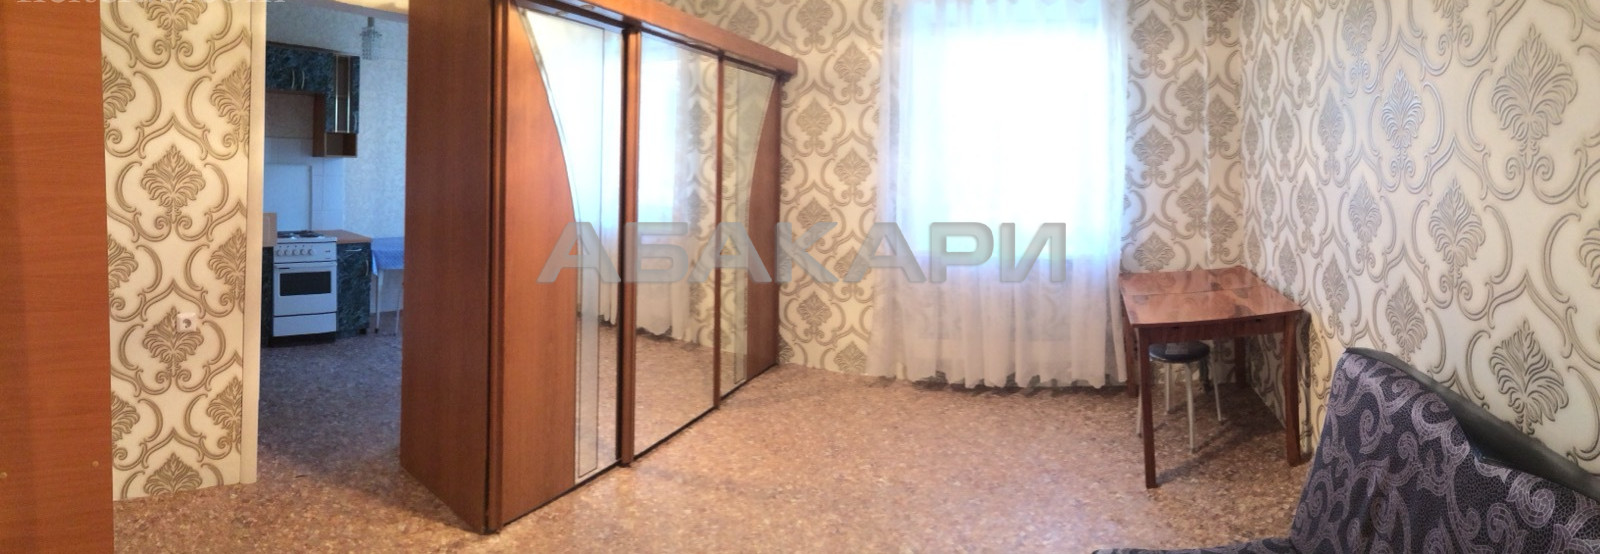 1-комнатная Свободный проспект БСМП ост. за 12000 руб/мес фото 6